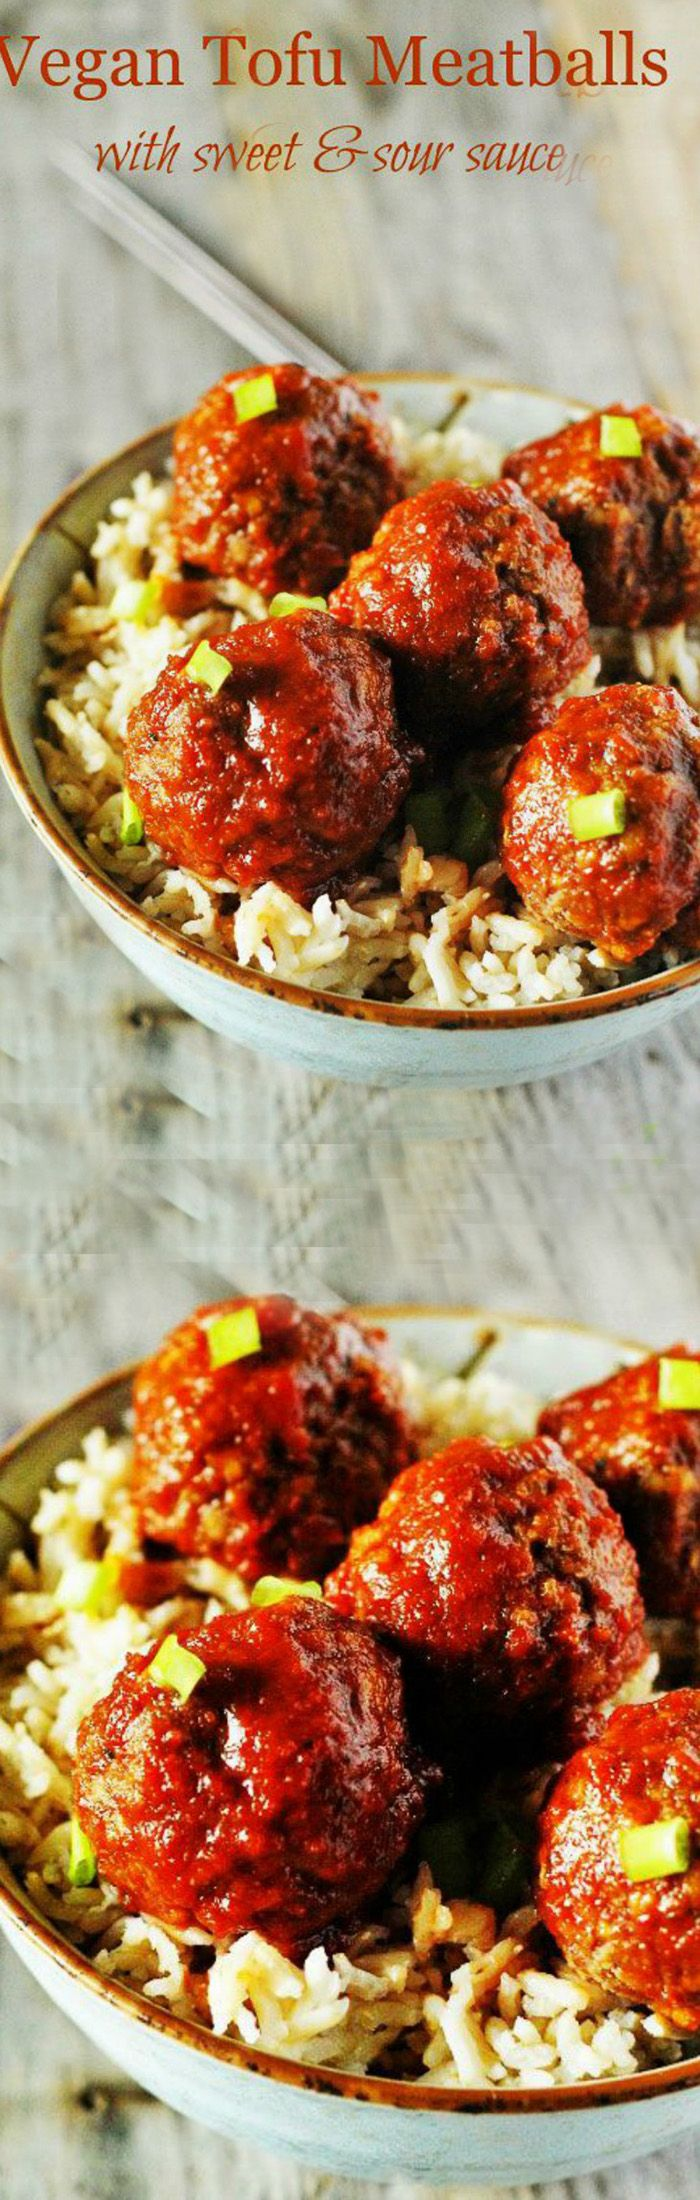 Vegan Tofu Meatballs with Sweet and Sour Sauce